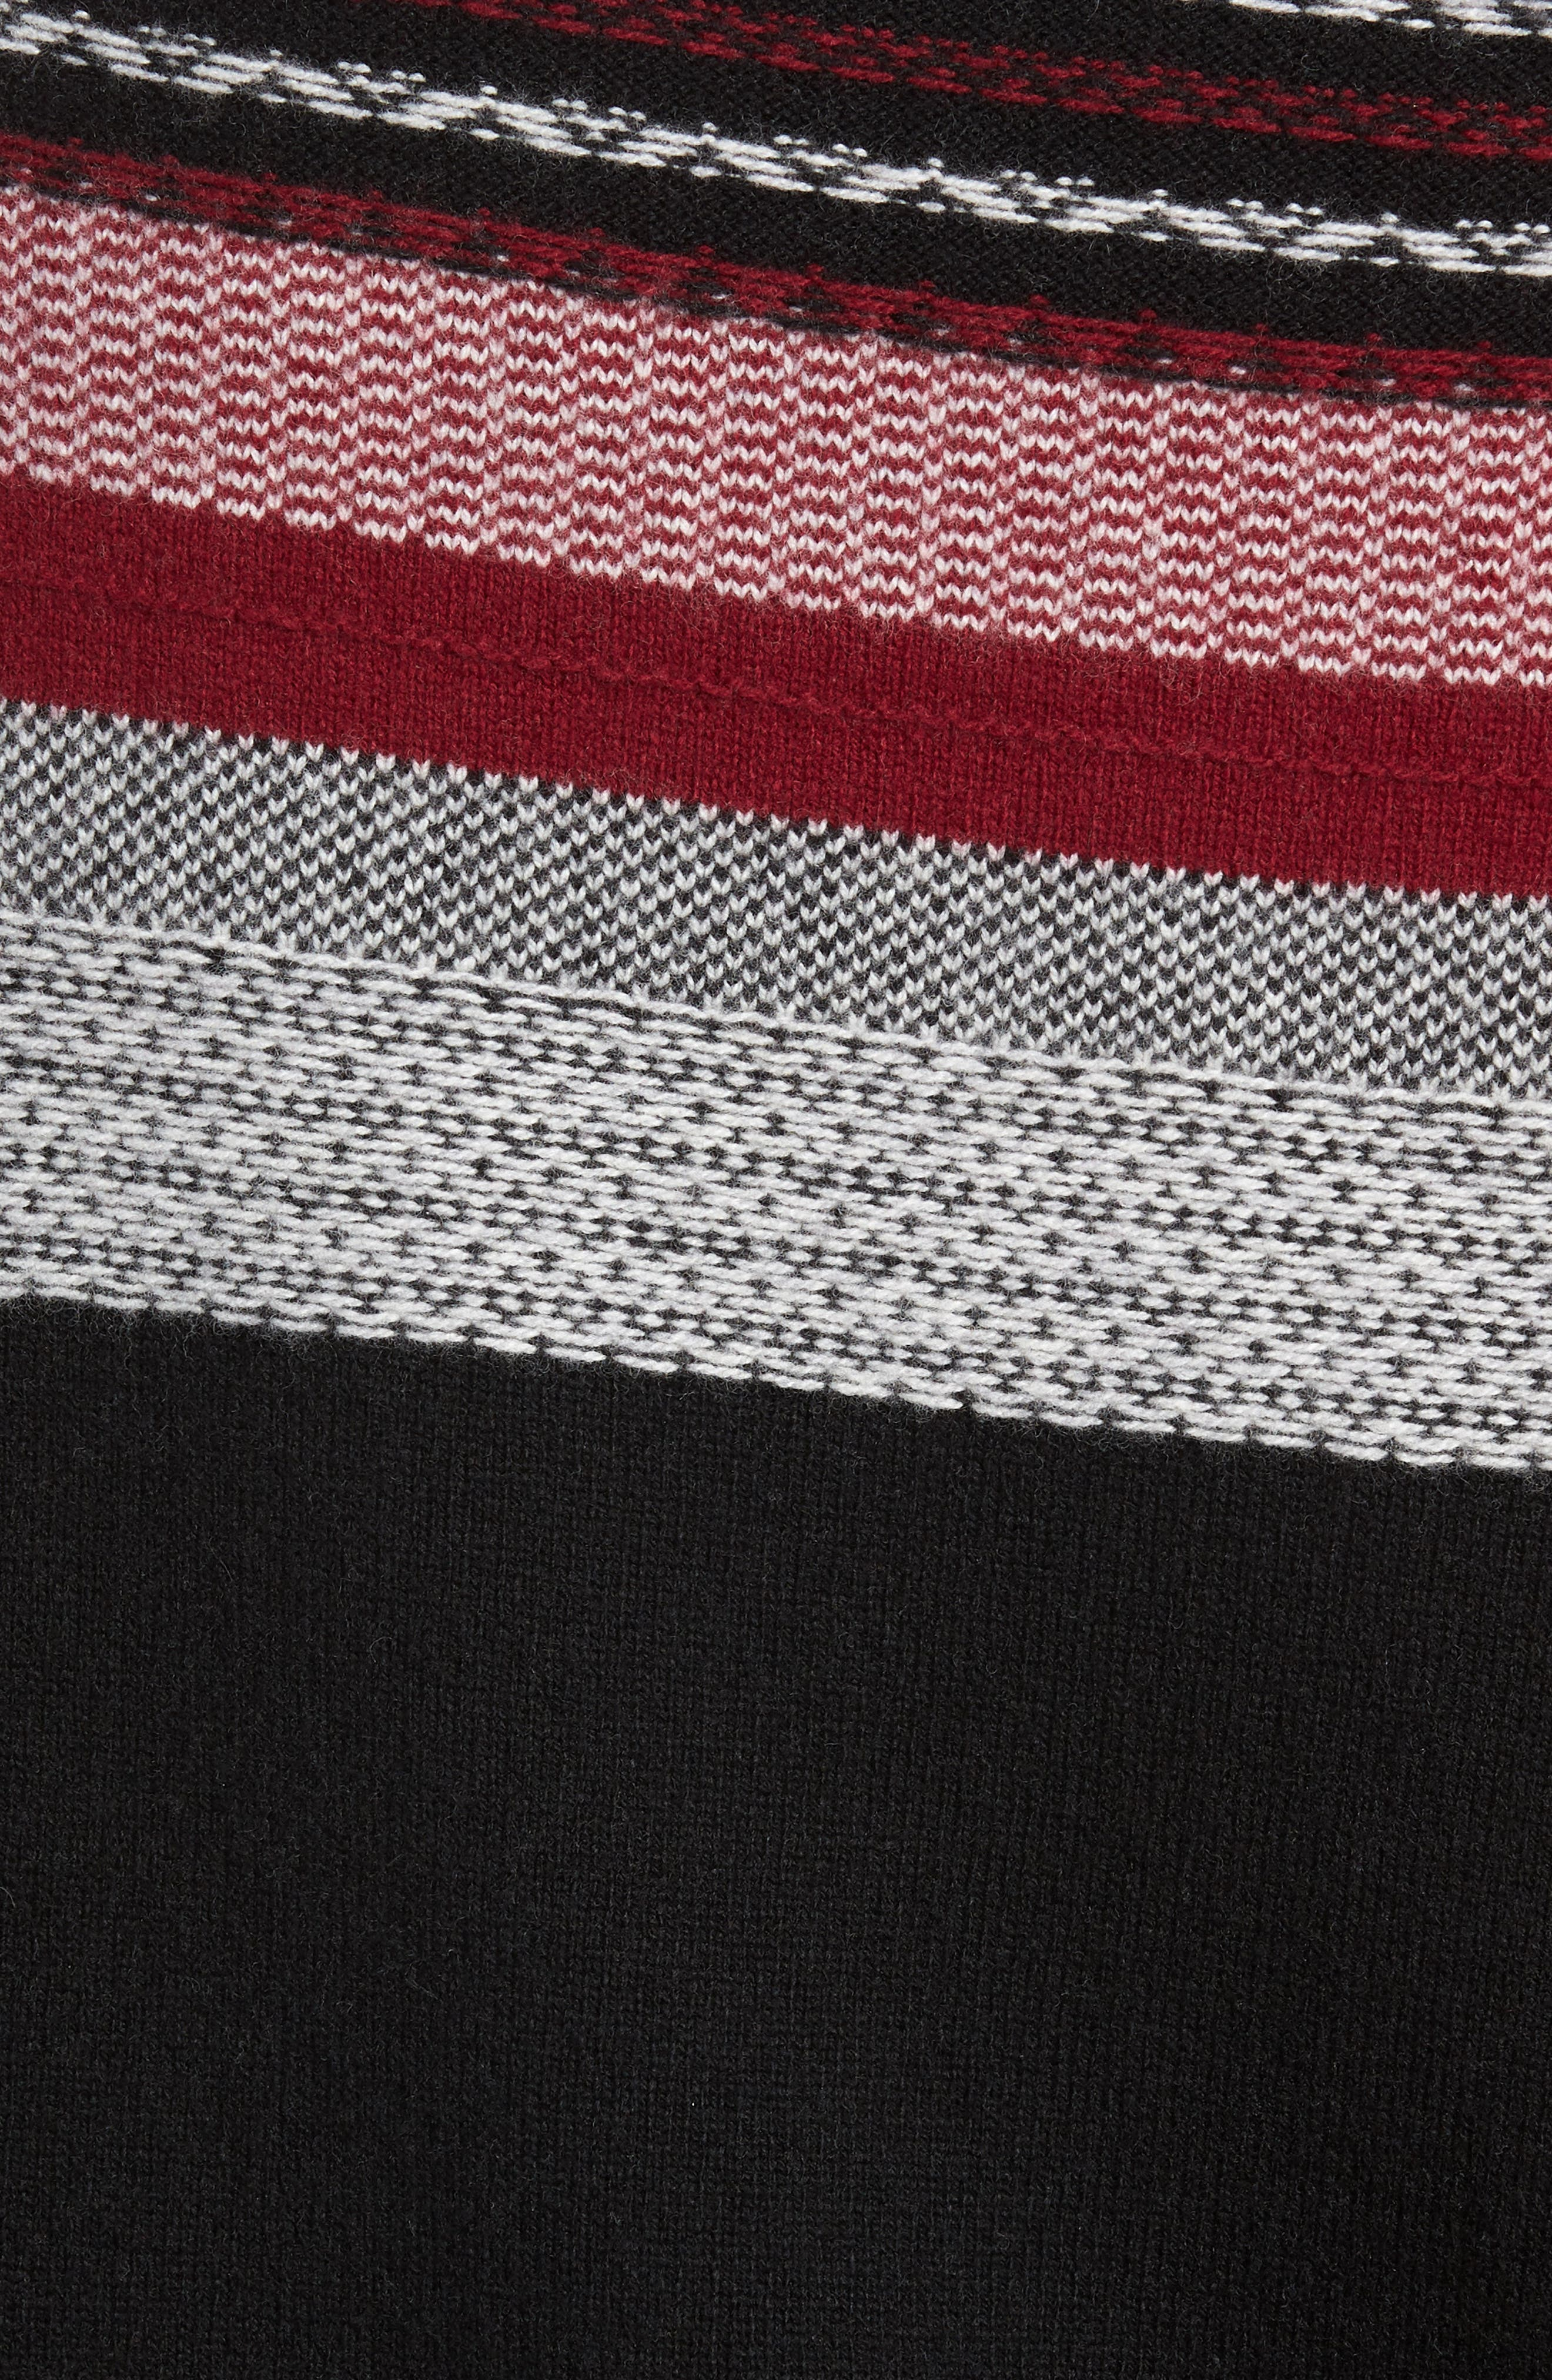 Fair Isle Sweater,                             Alternate thumbnail 5, color,                             BLACK/ RED COMBO